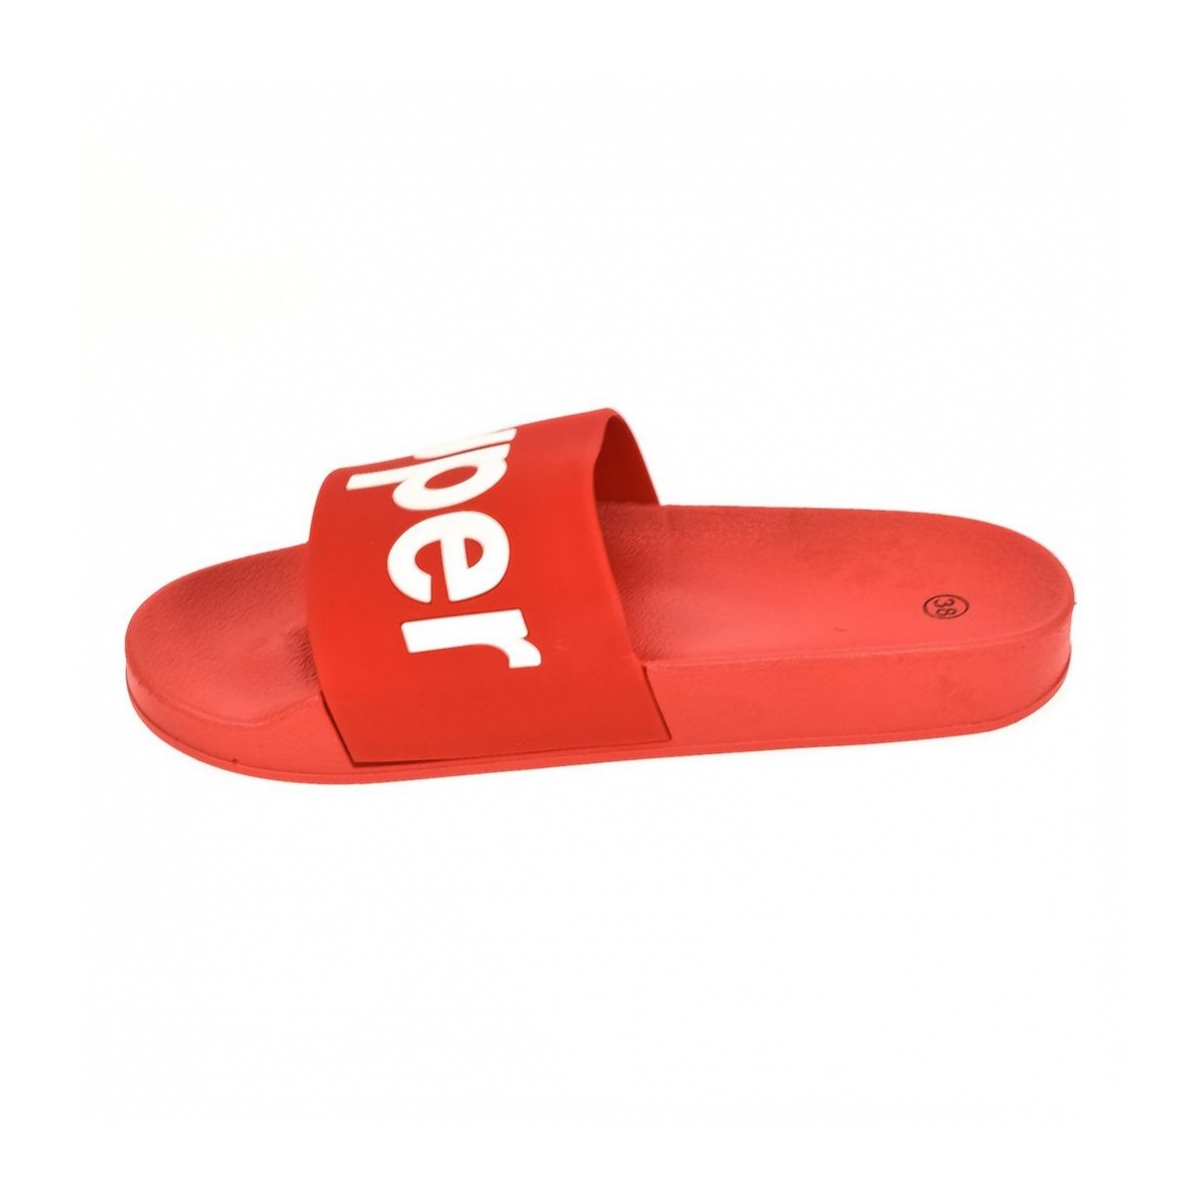 5e8a280ffb22 Dámske červené šľapky SUPER - 5